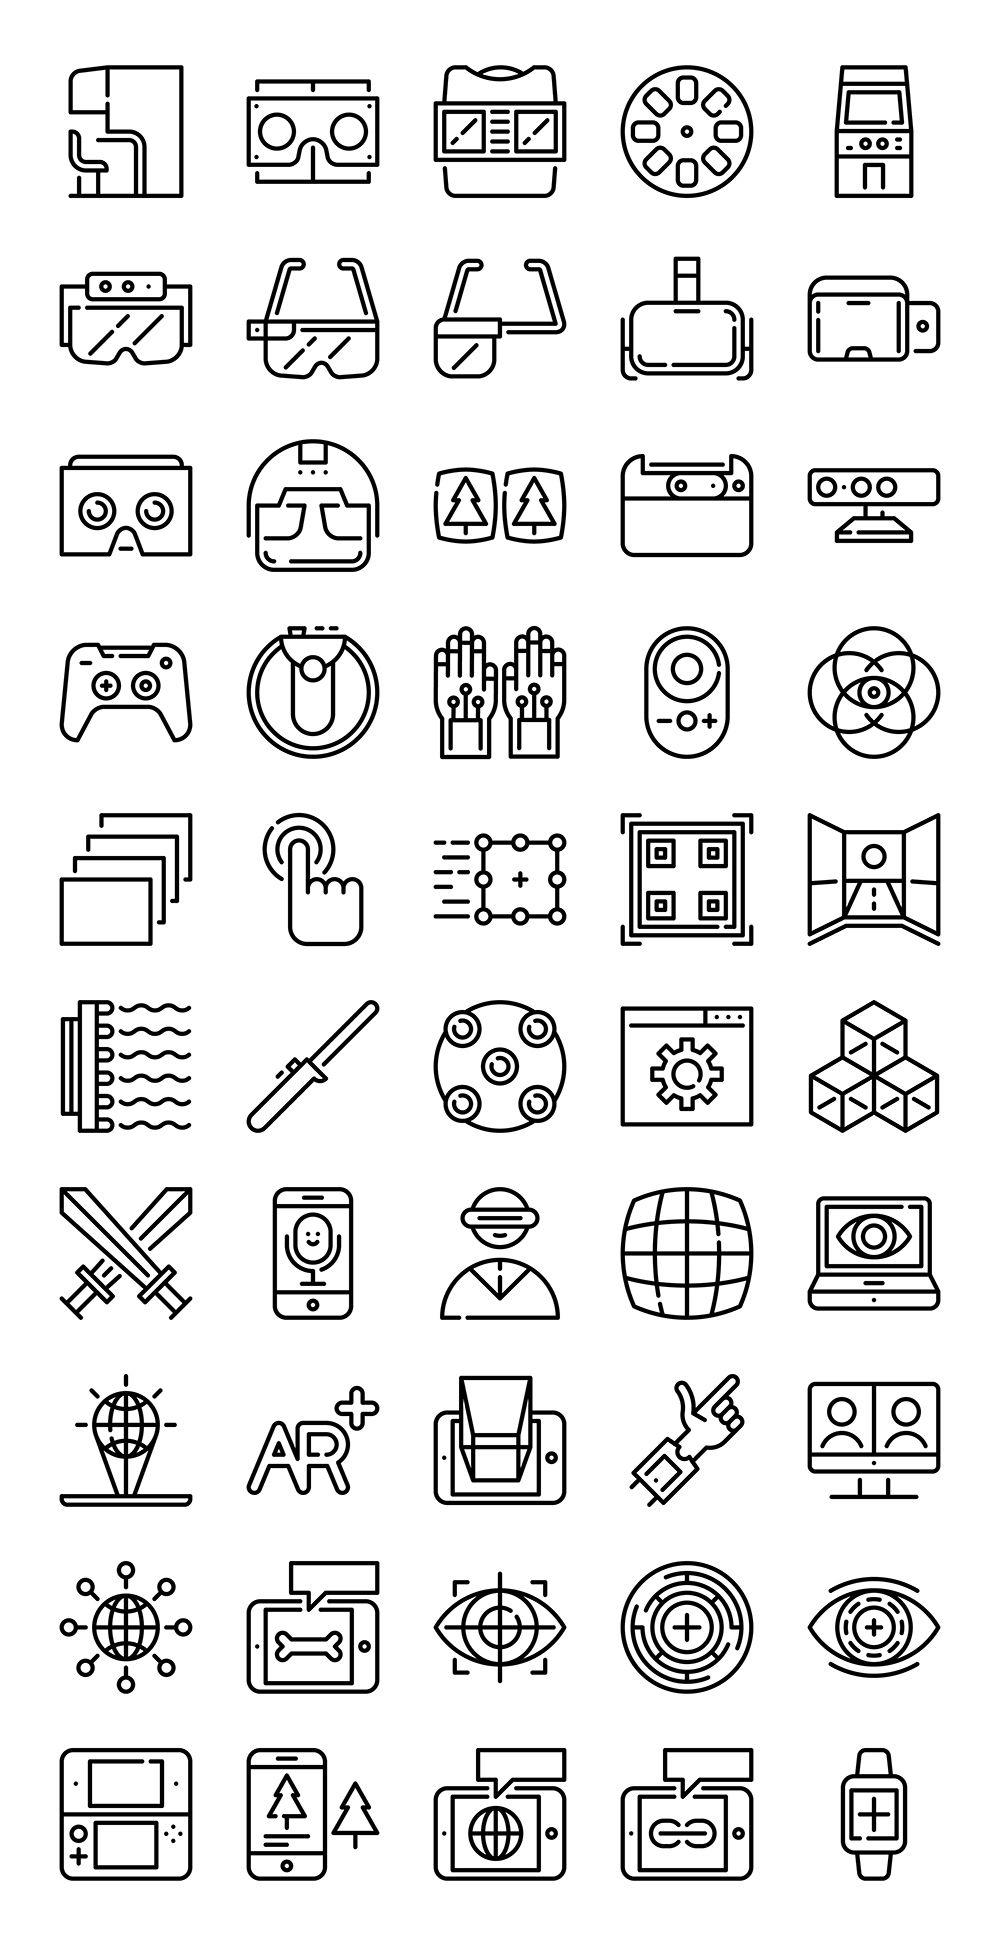 Wireless icon line iconset iconsmind - 50 Free Virtual Augmented Reality Icons Flaticon